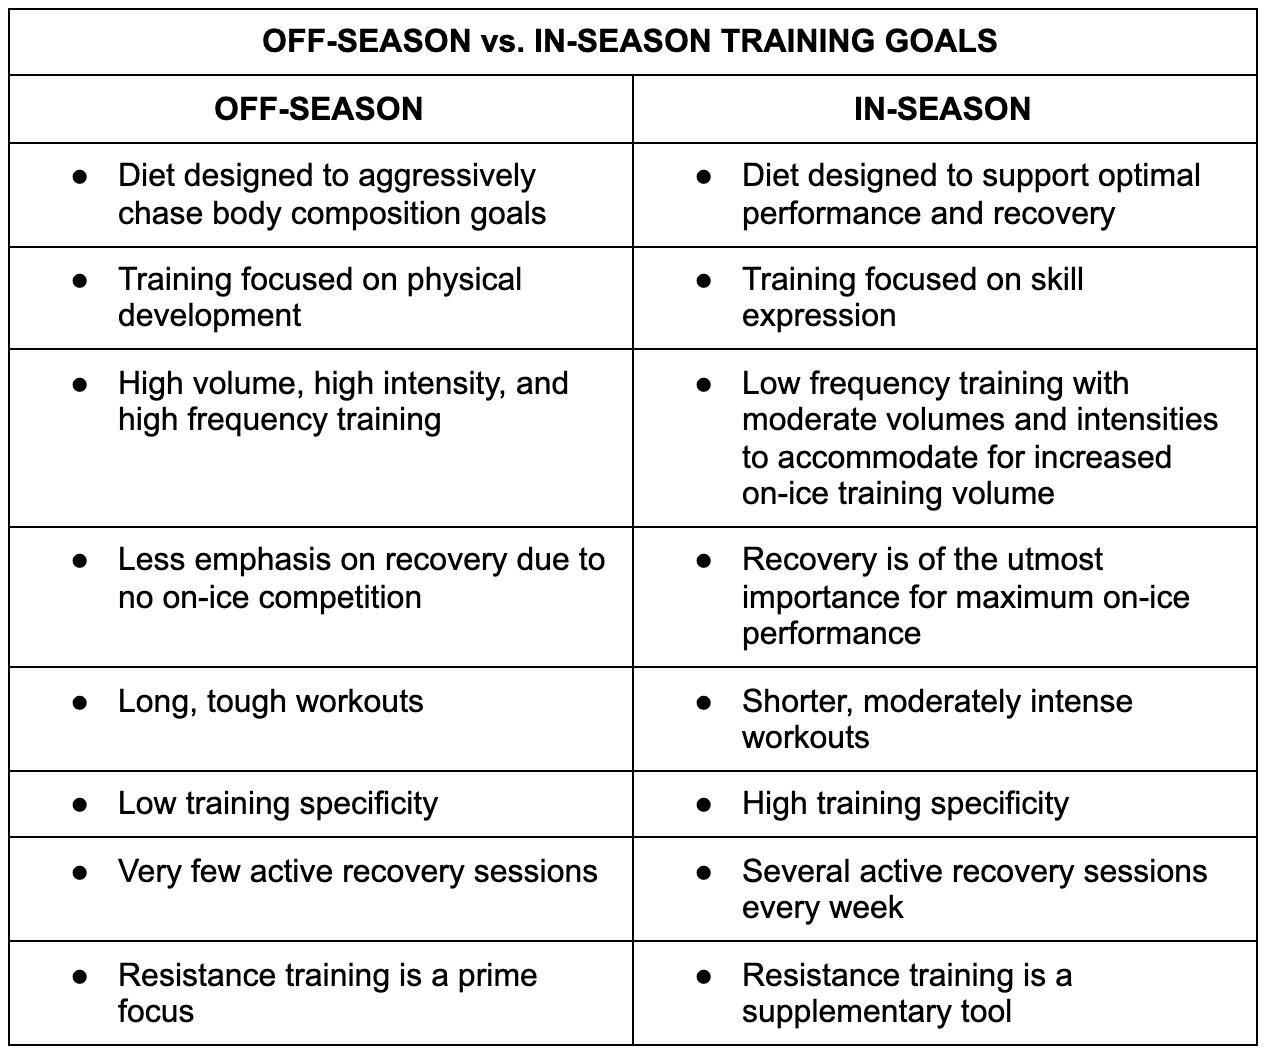 off-season vs in-season training goals